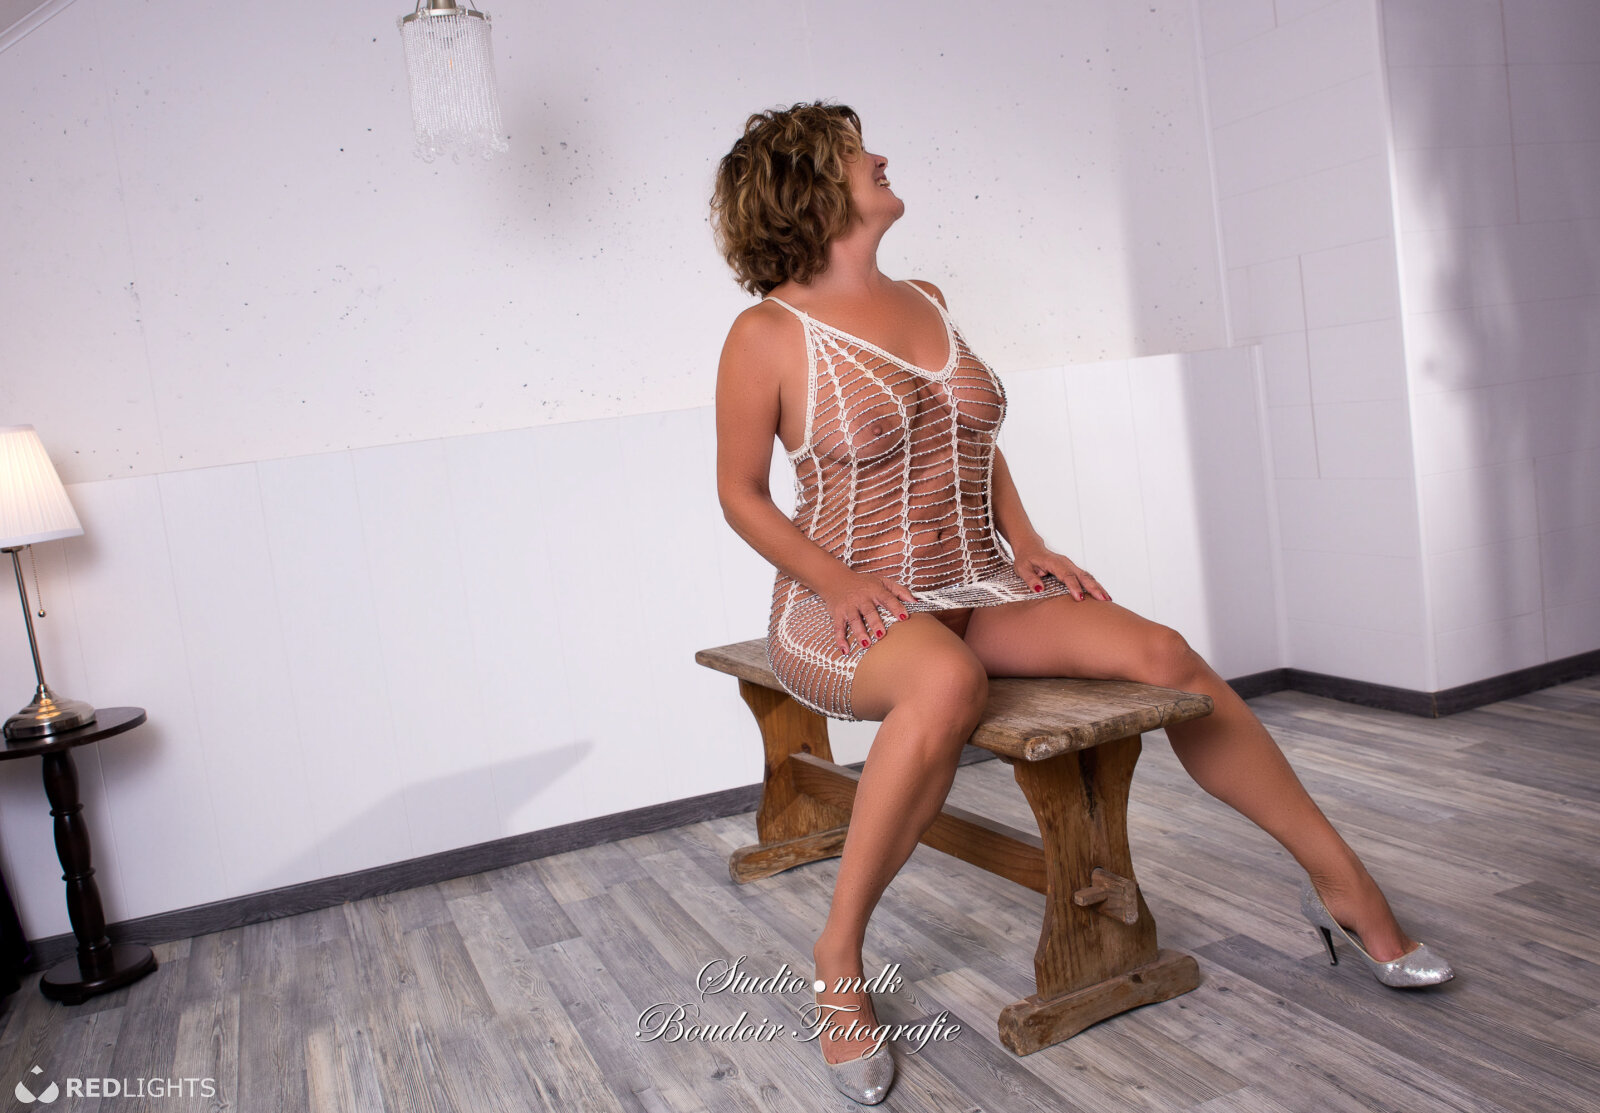 123video inloggen sensuele massage nijmegen